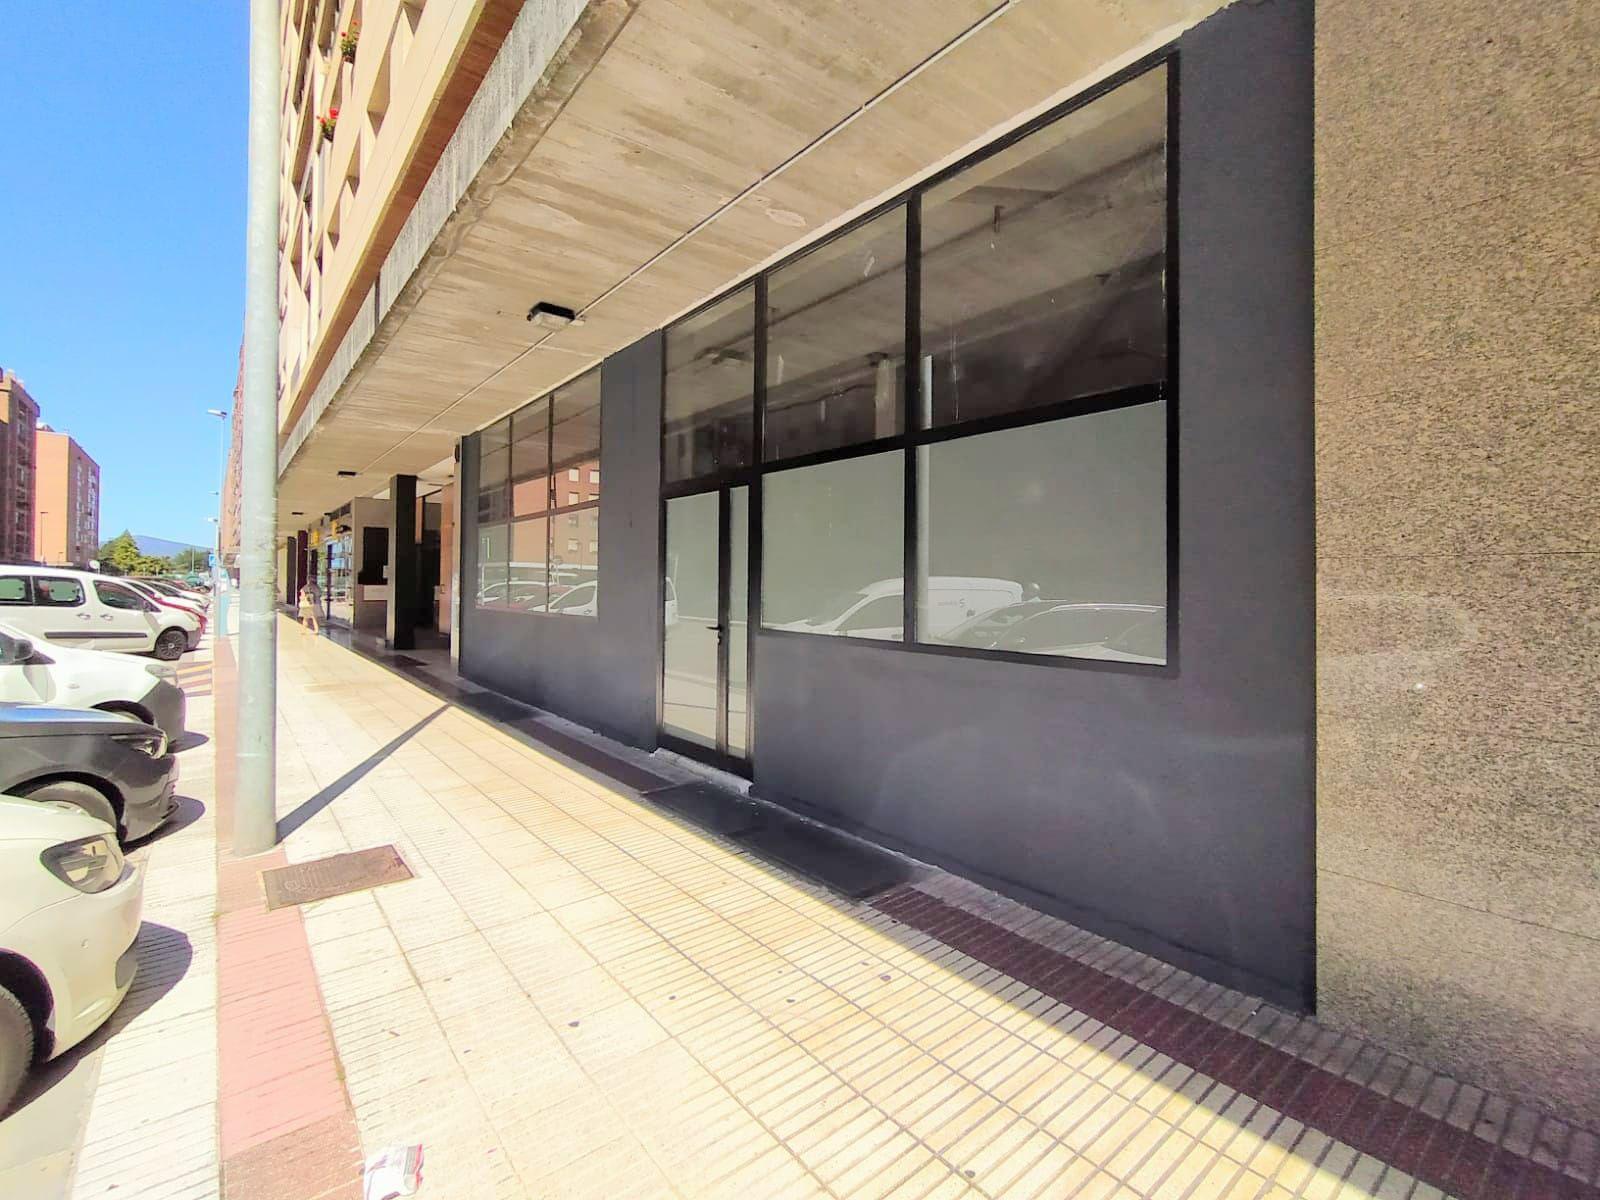 Local comercial en Pamplona, Mendebaldea, alquiler